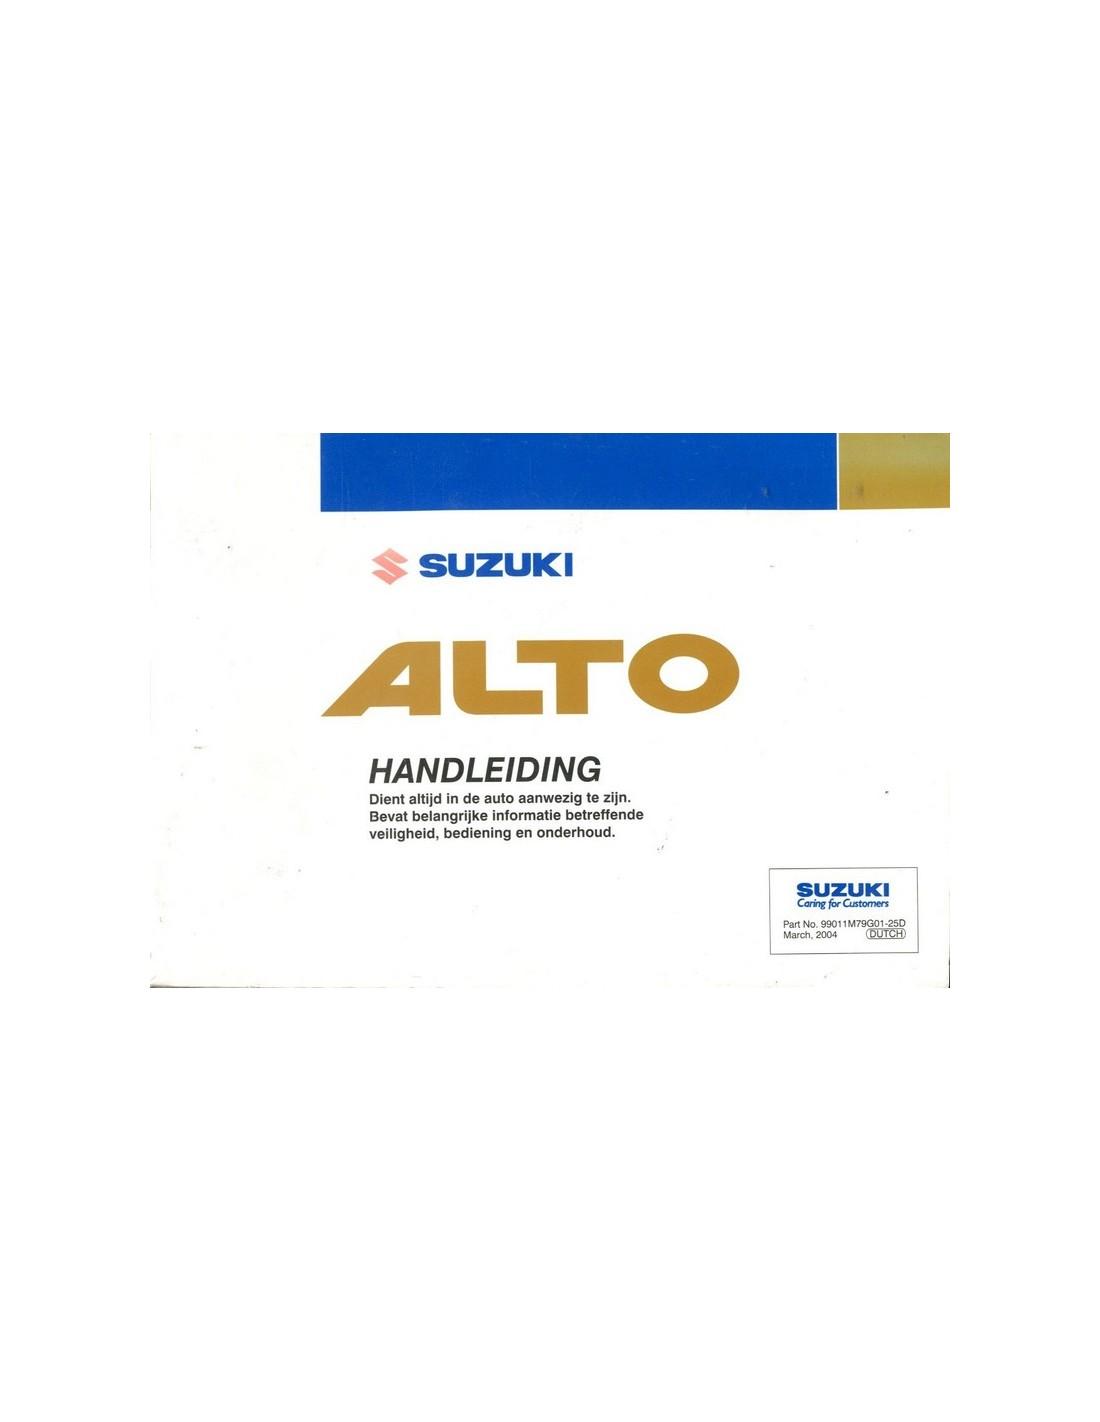 2004 suzuki alto owner s manual dutch rh autolit eu auto owners manuals online auto owners manual cover